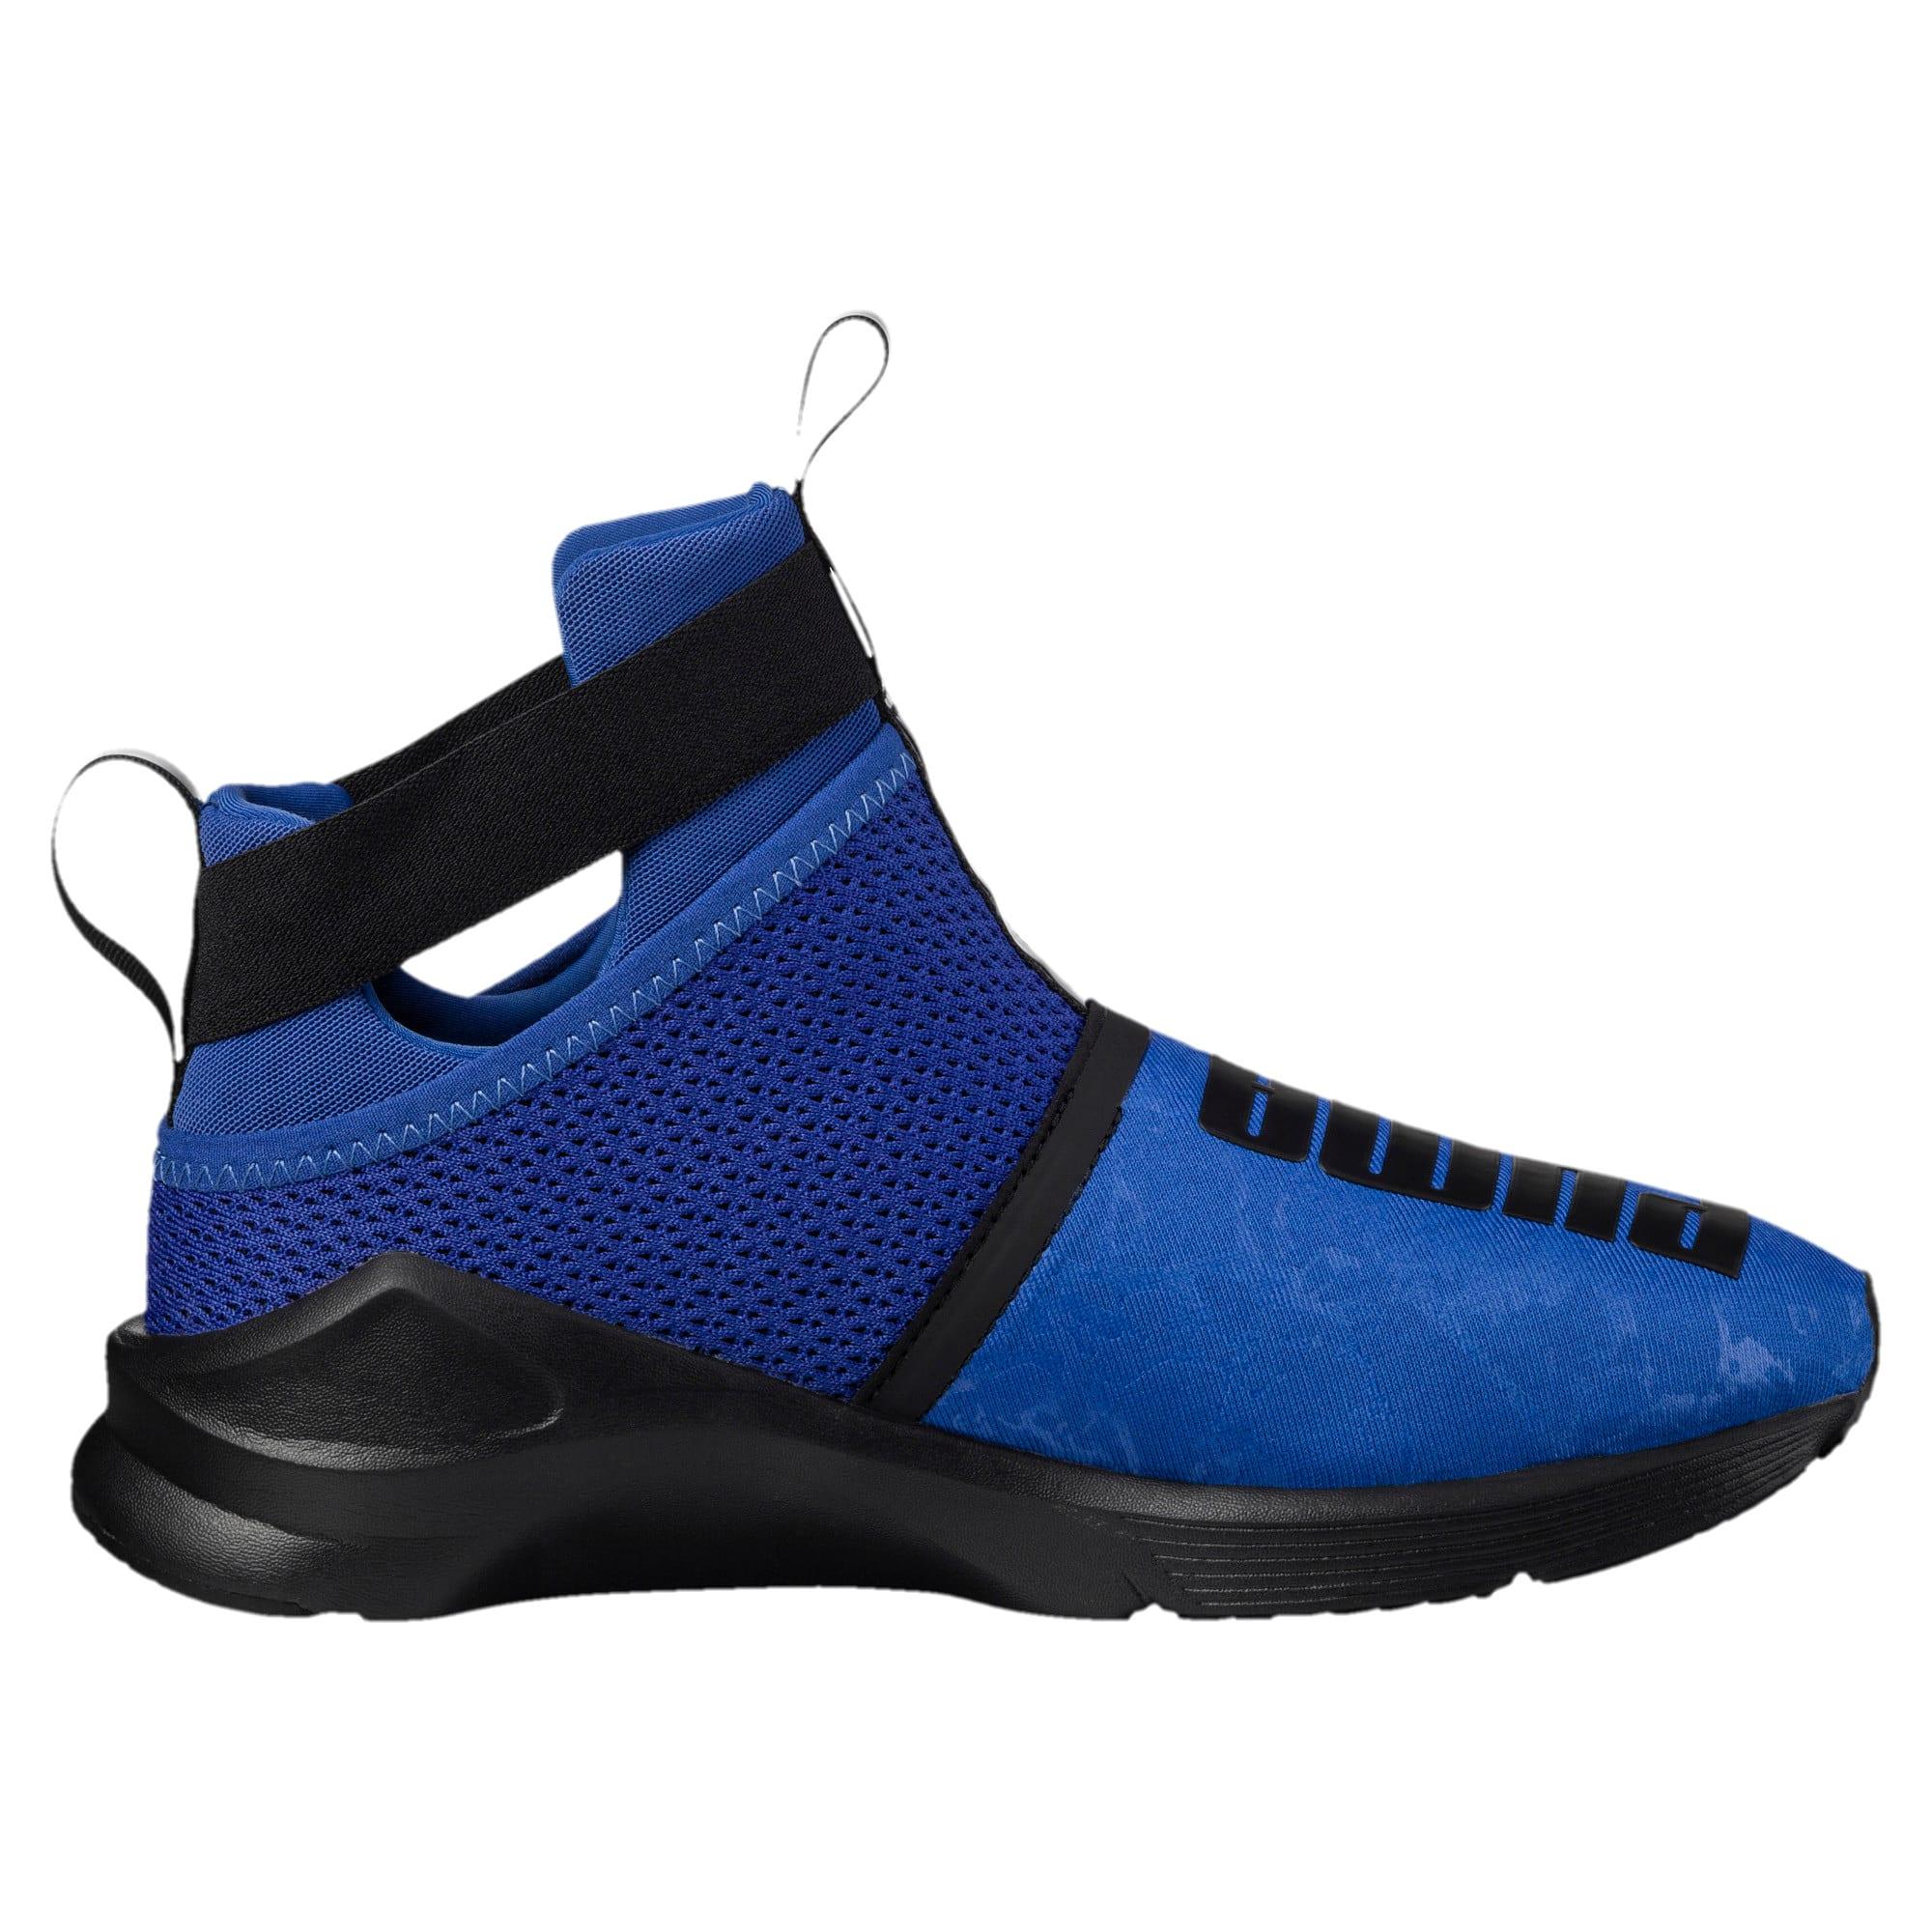 Thumbnail 4 of PUMA Fierce Strap Training Shoes, TRUE BLUE-Puma Black, medium-IND